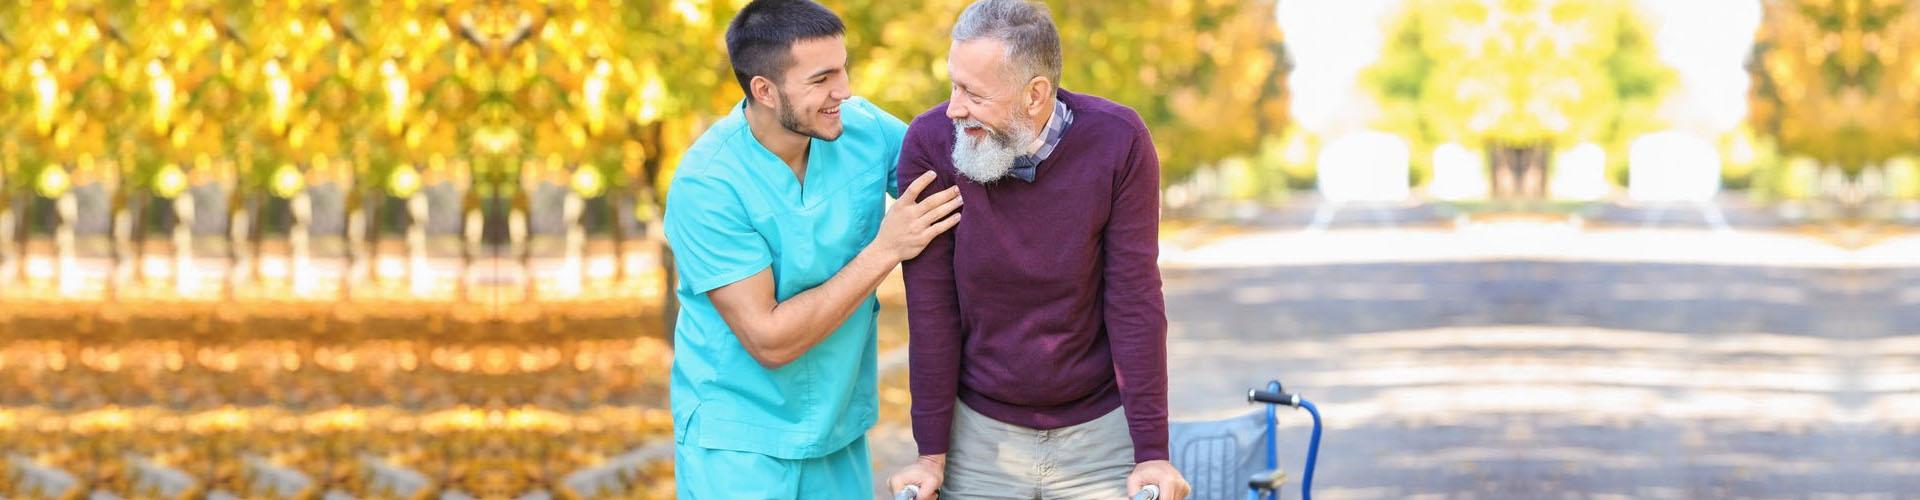 a caregiver accompanying a senior man walk outside